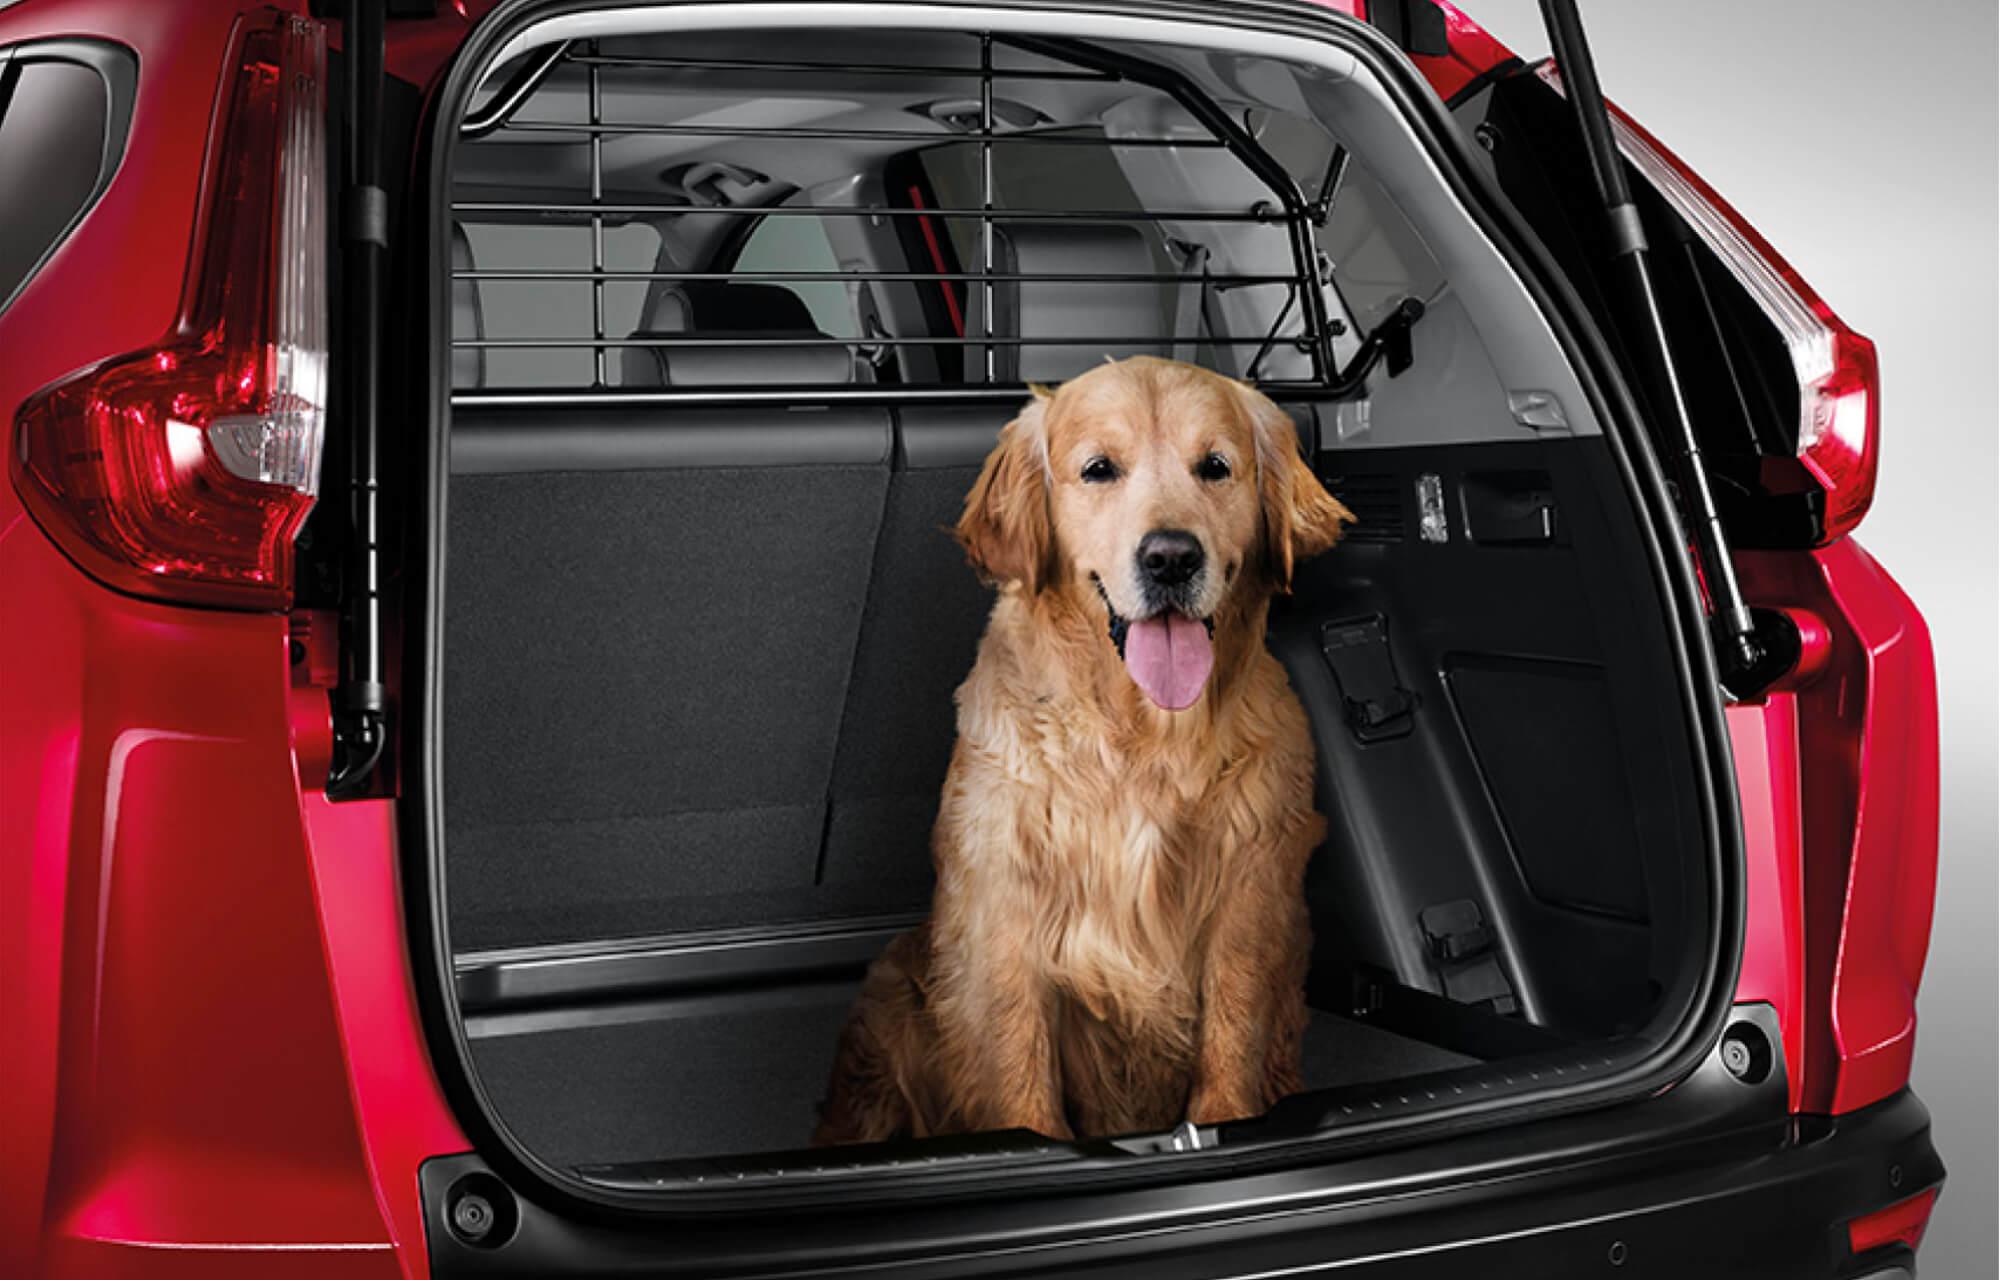 CR-V Dog Guard